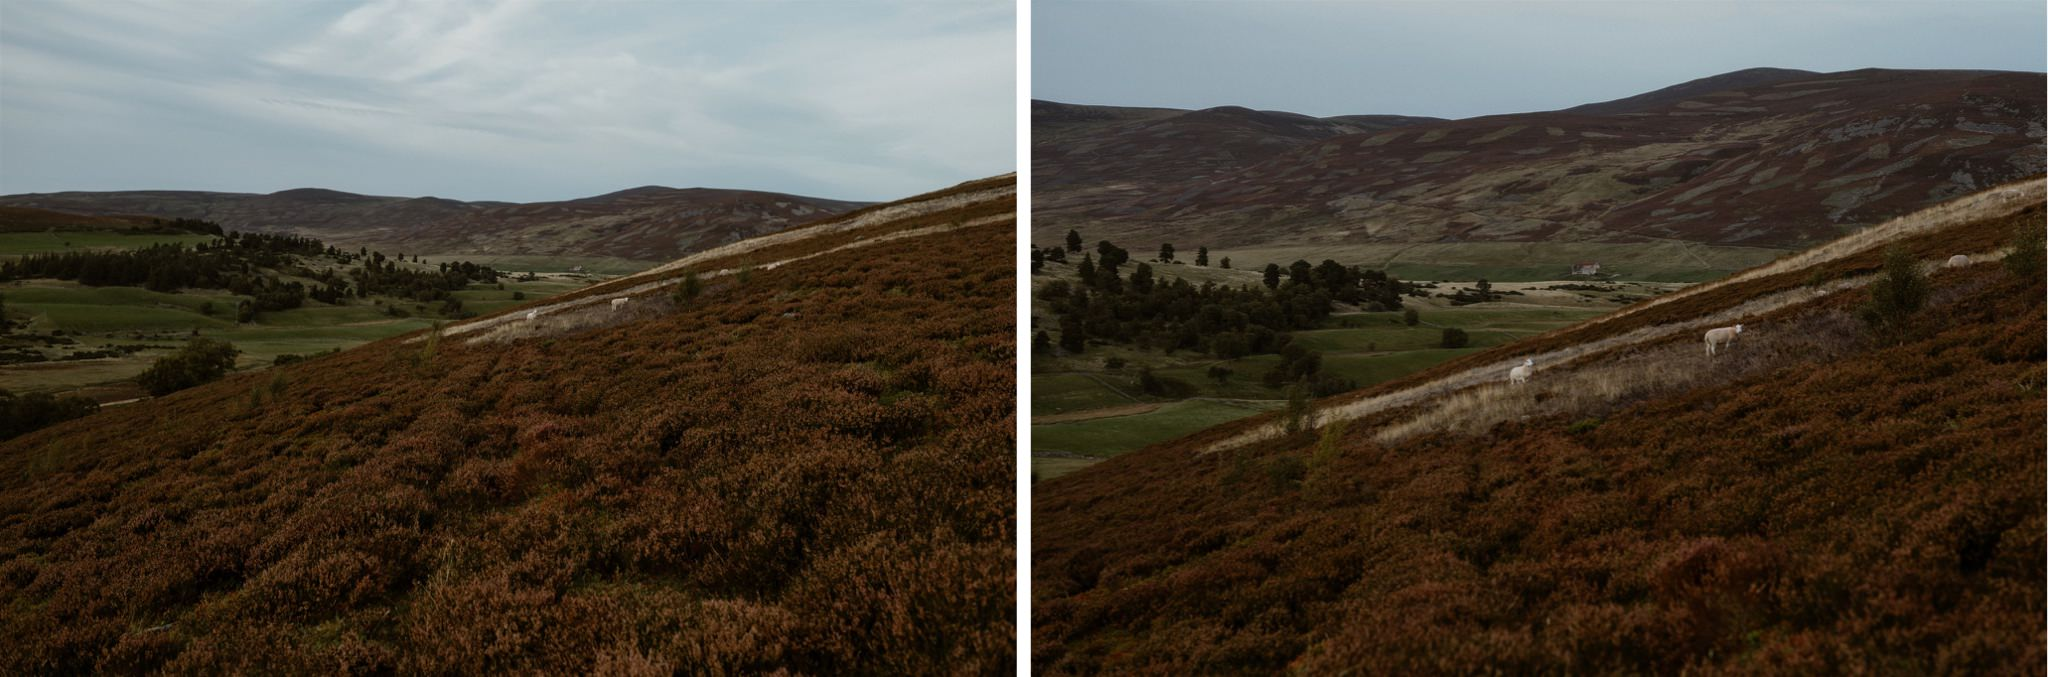 Scottish Highland landscape in the Cairngorms